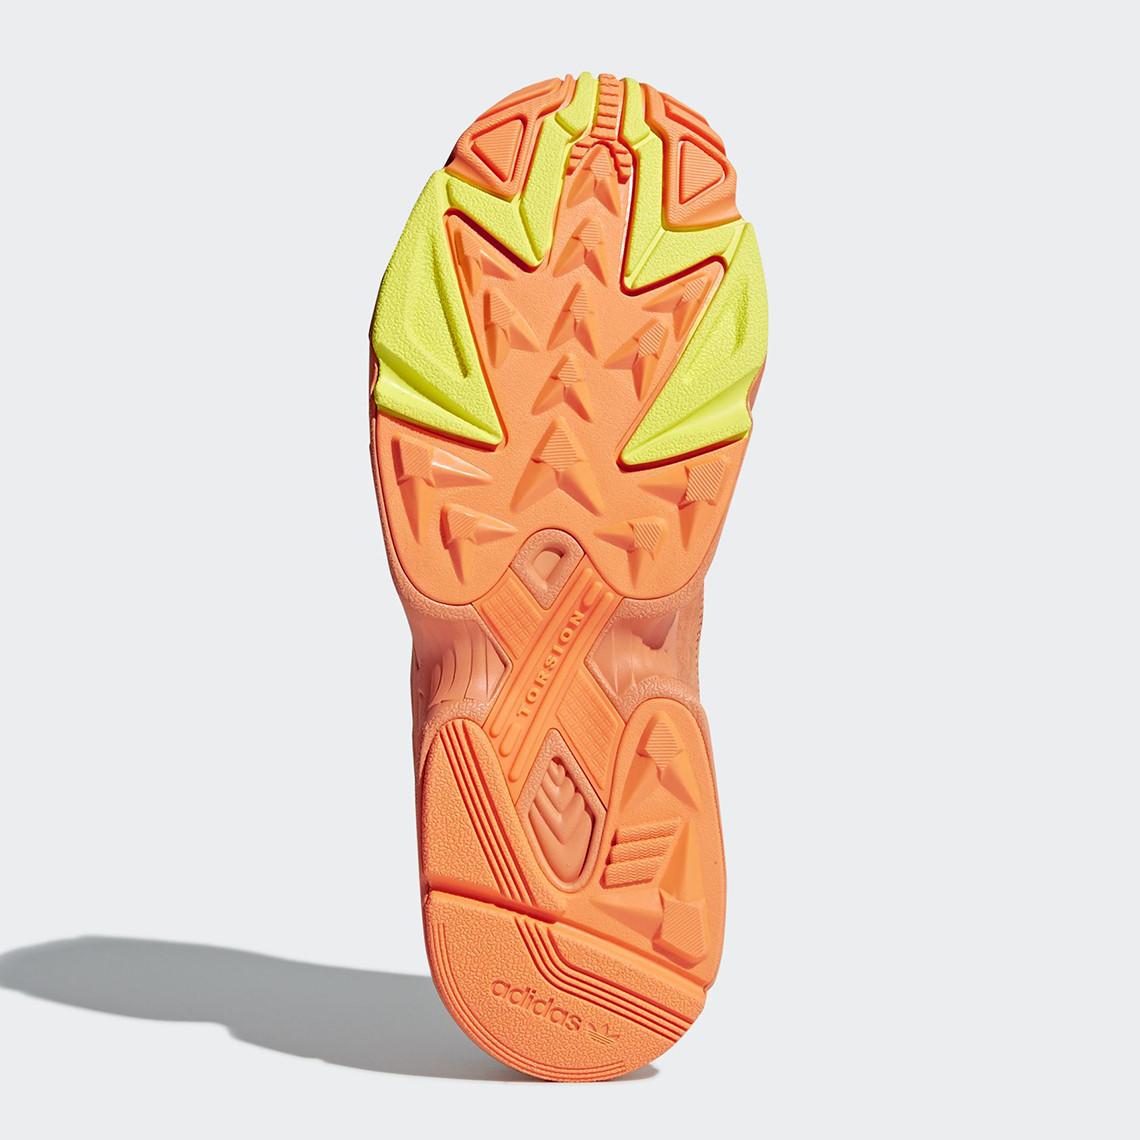 sepatu adidas Yung-1 2018 - Sneakers Baru Adidas 2018 - Orange Goku Dragon Ball